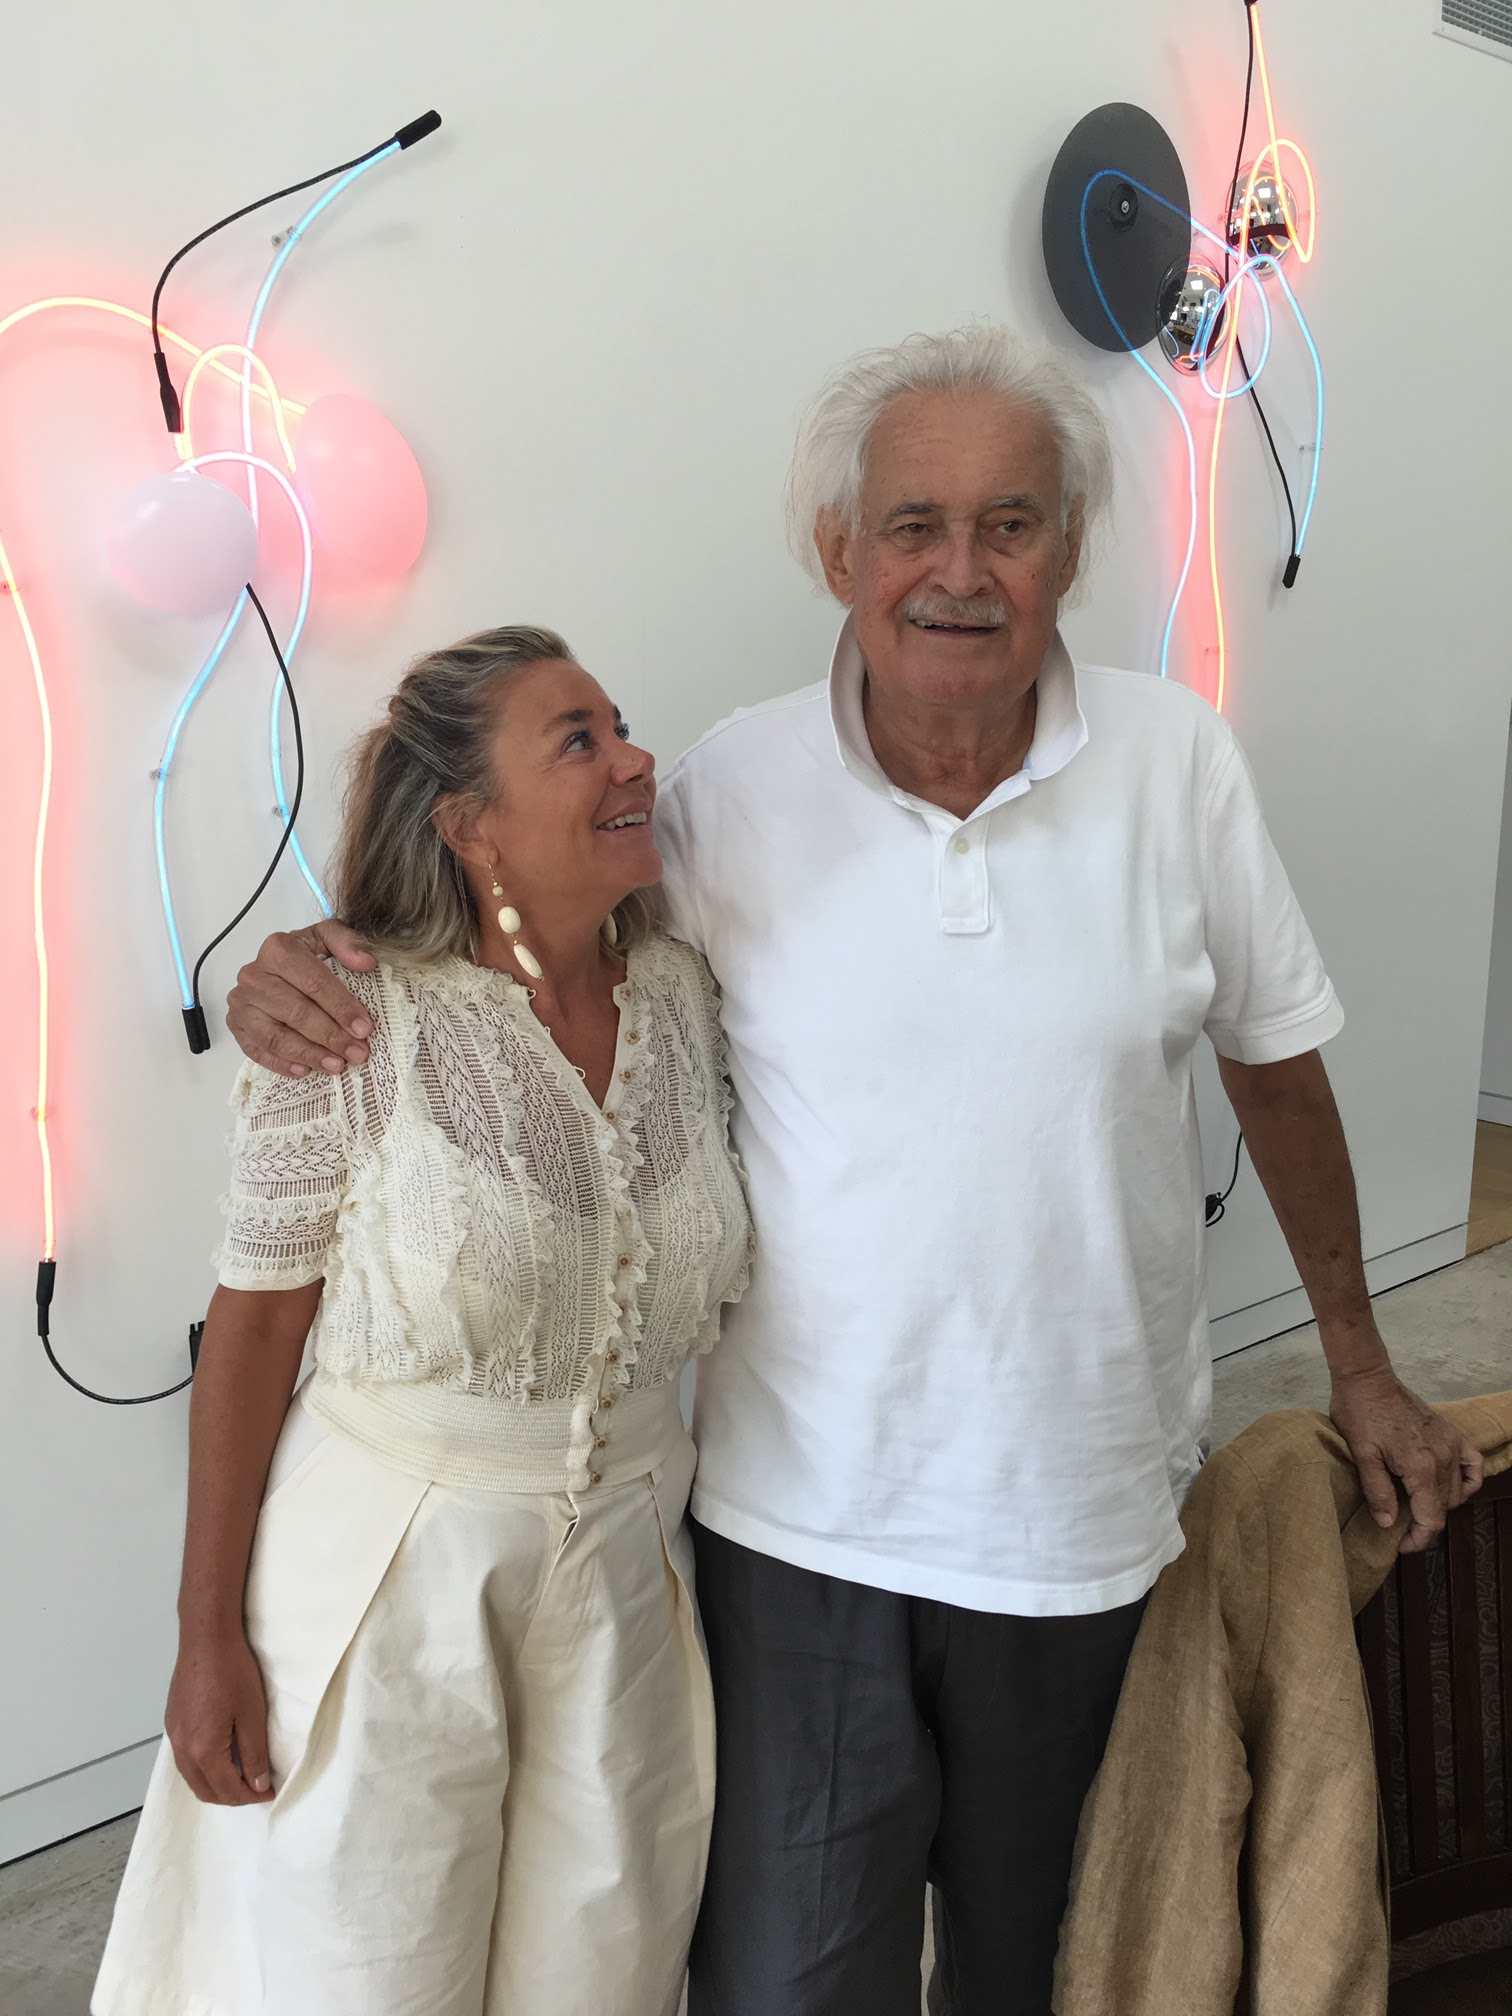 Keith Sonnier e Annamaria Maggi, Bridgehampton NY, 2018. Courtesy Galleria Fumagalli